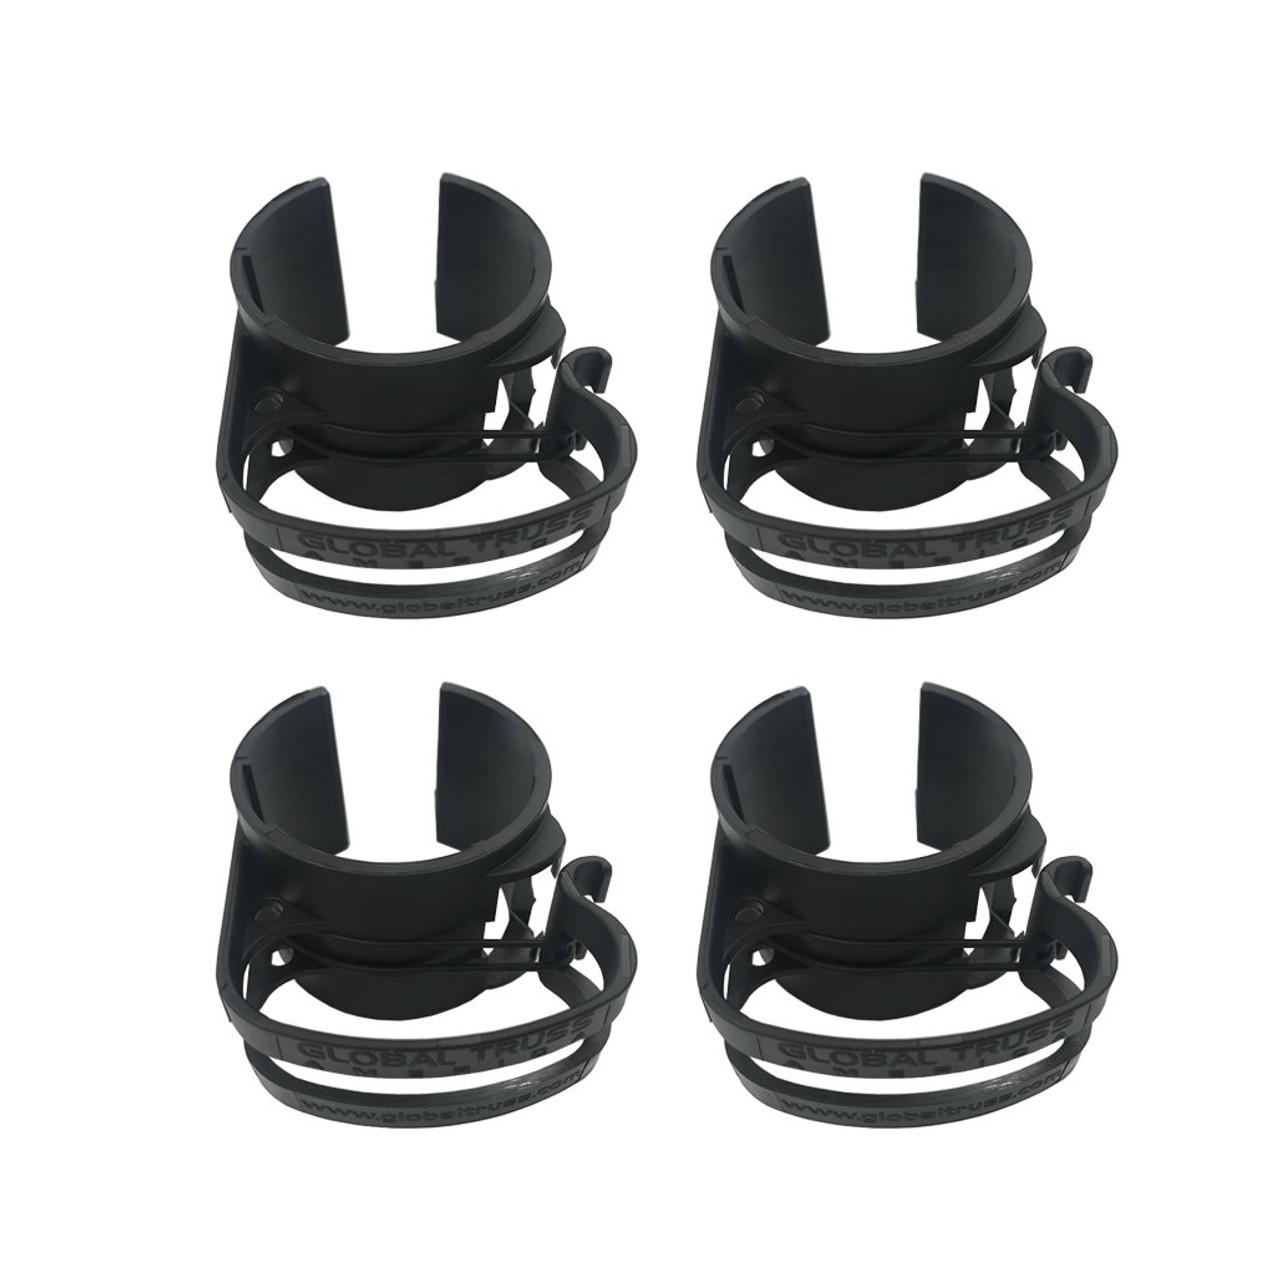 Global Truss DT Snap On Black Cable Management Clips 4 Pack- Black